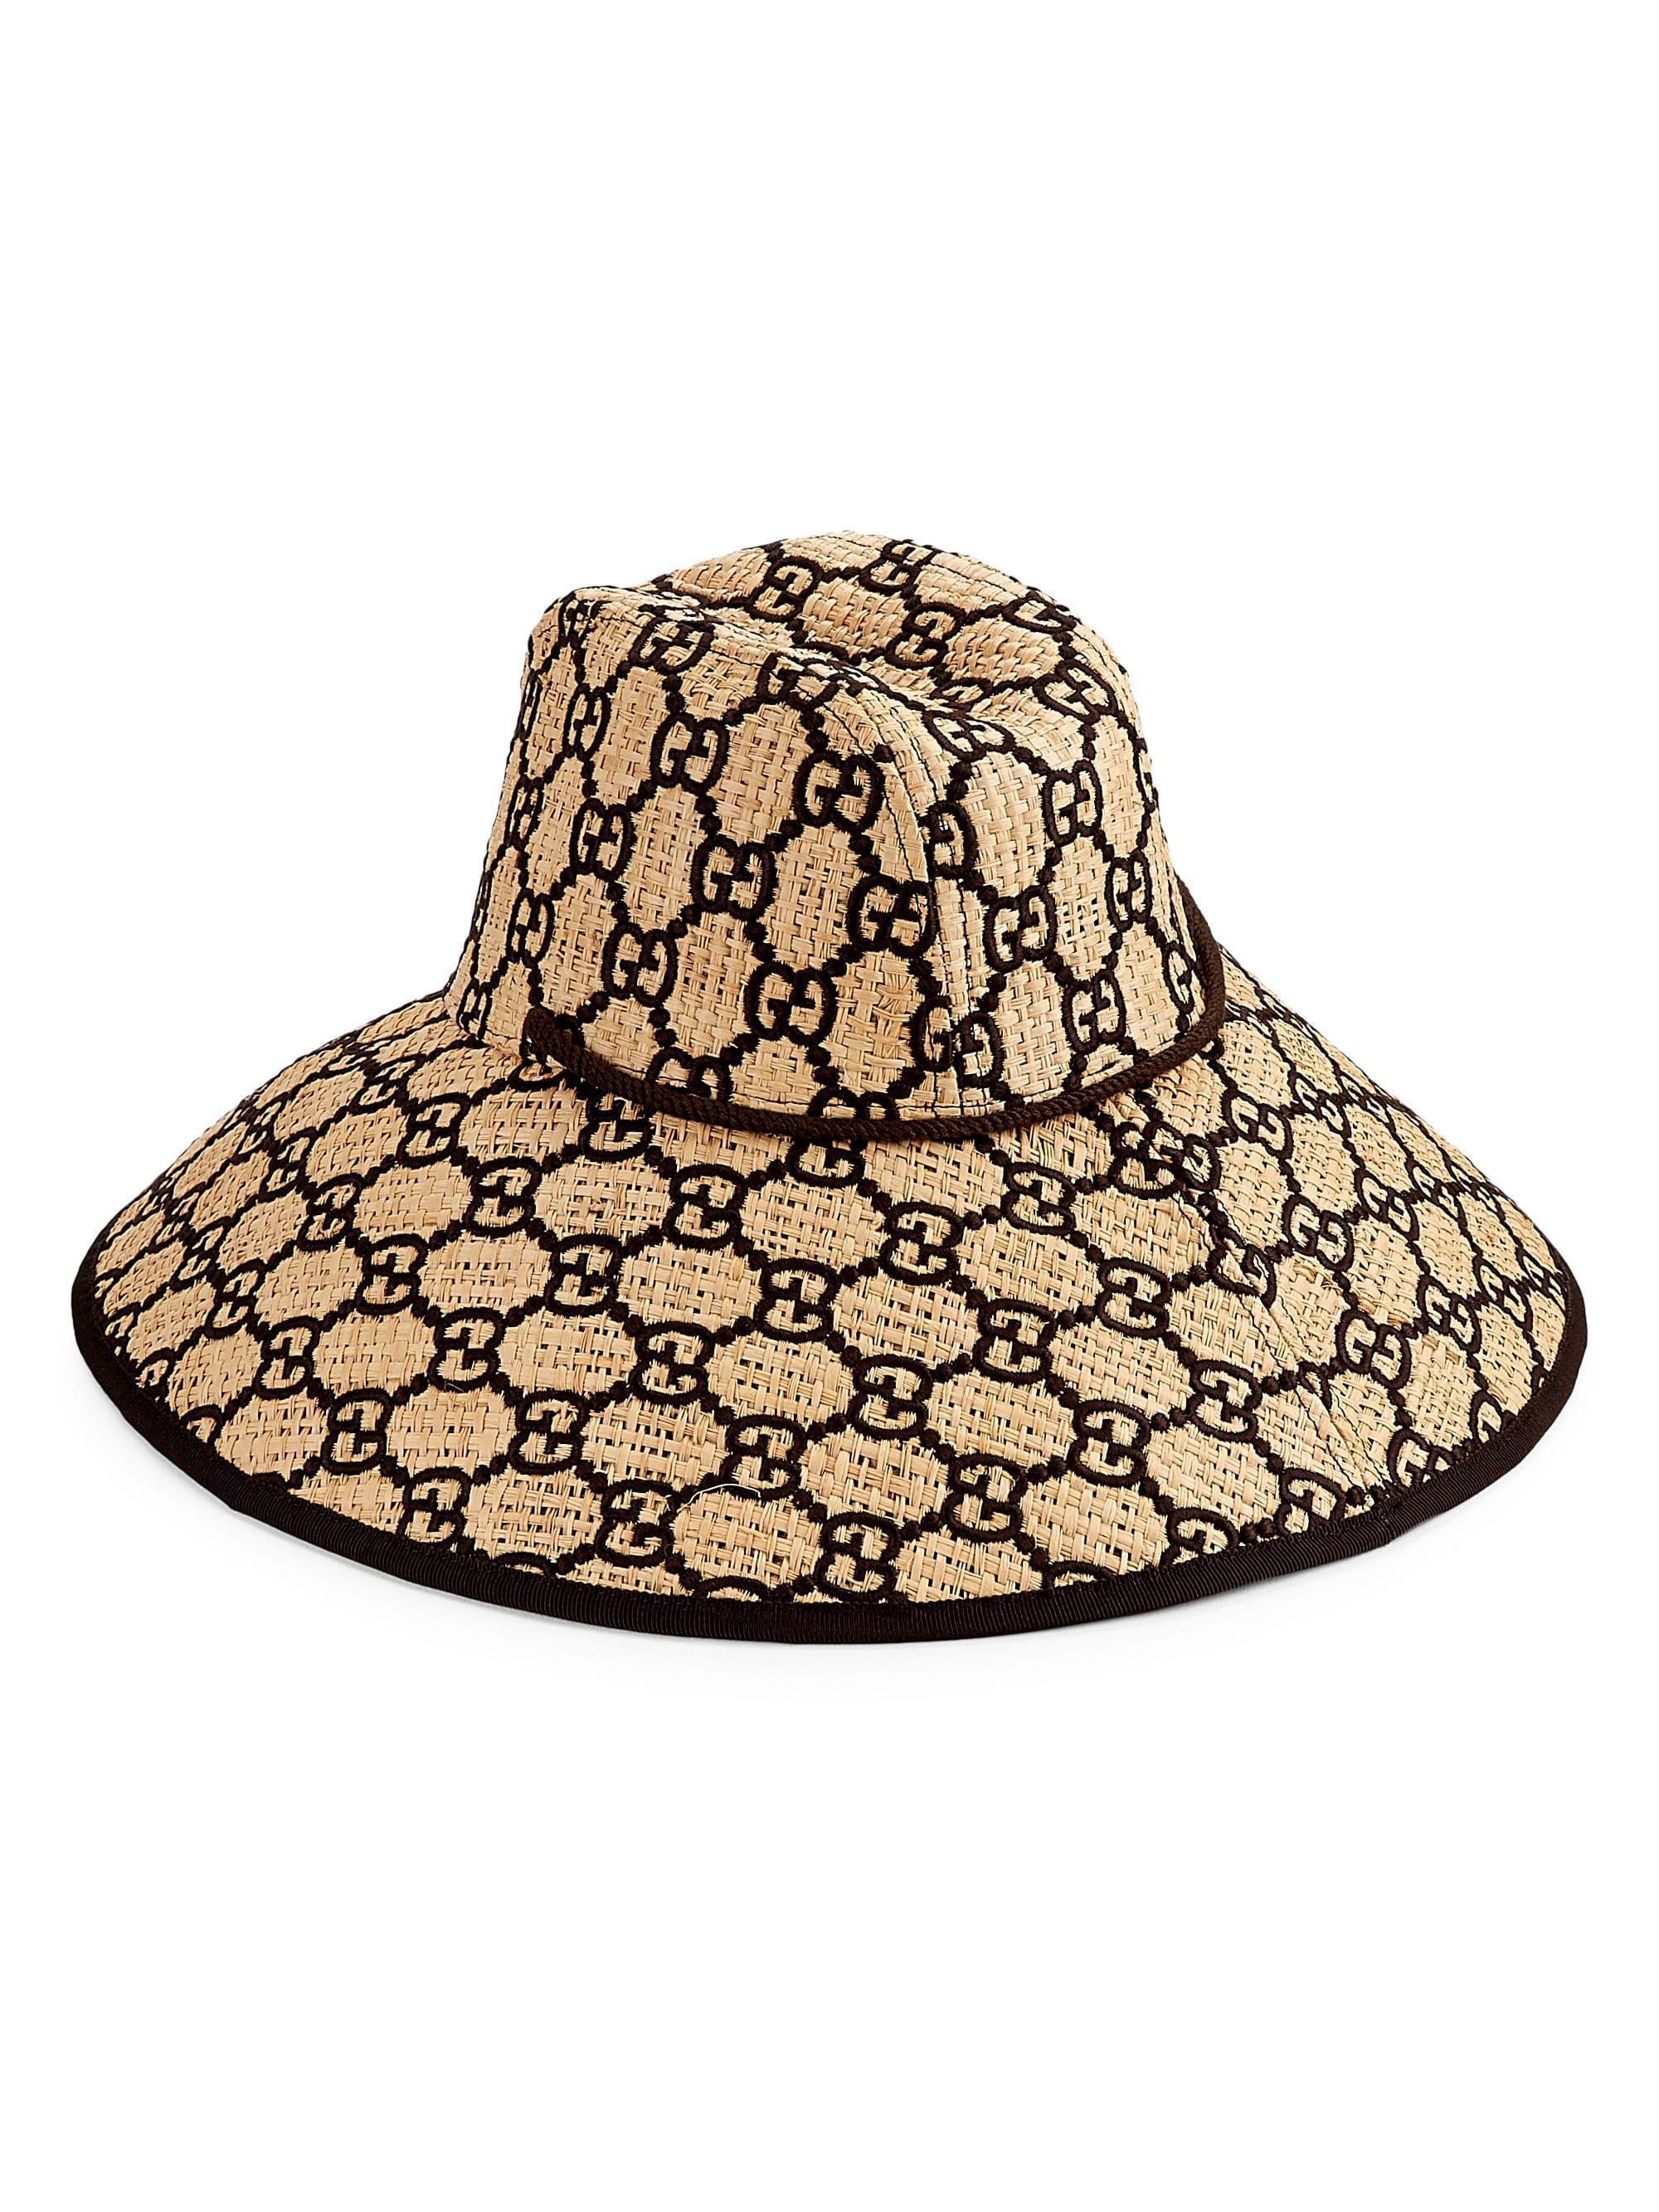 0e6423b5264241 Gucci Gg Logo Wide Brimmed Raffia Hat - Lyst